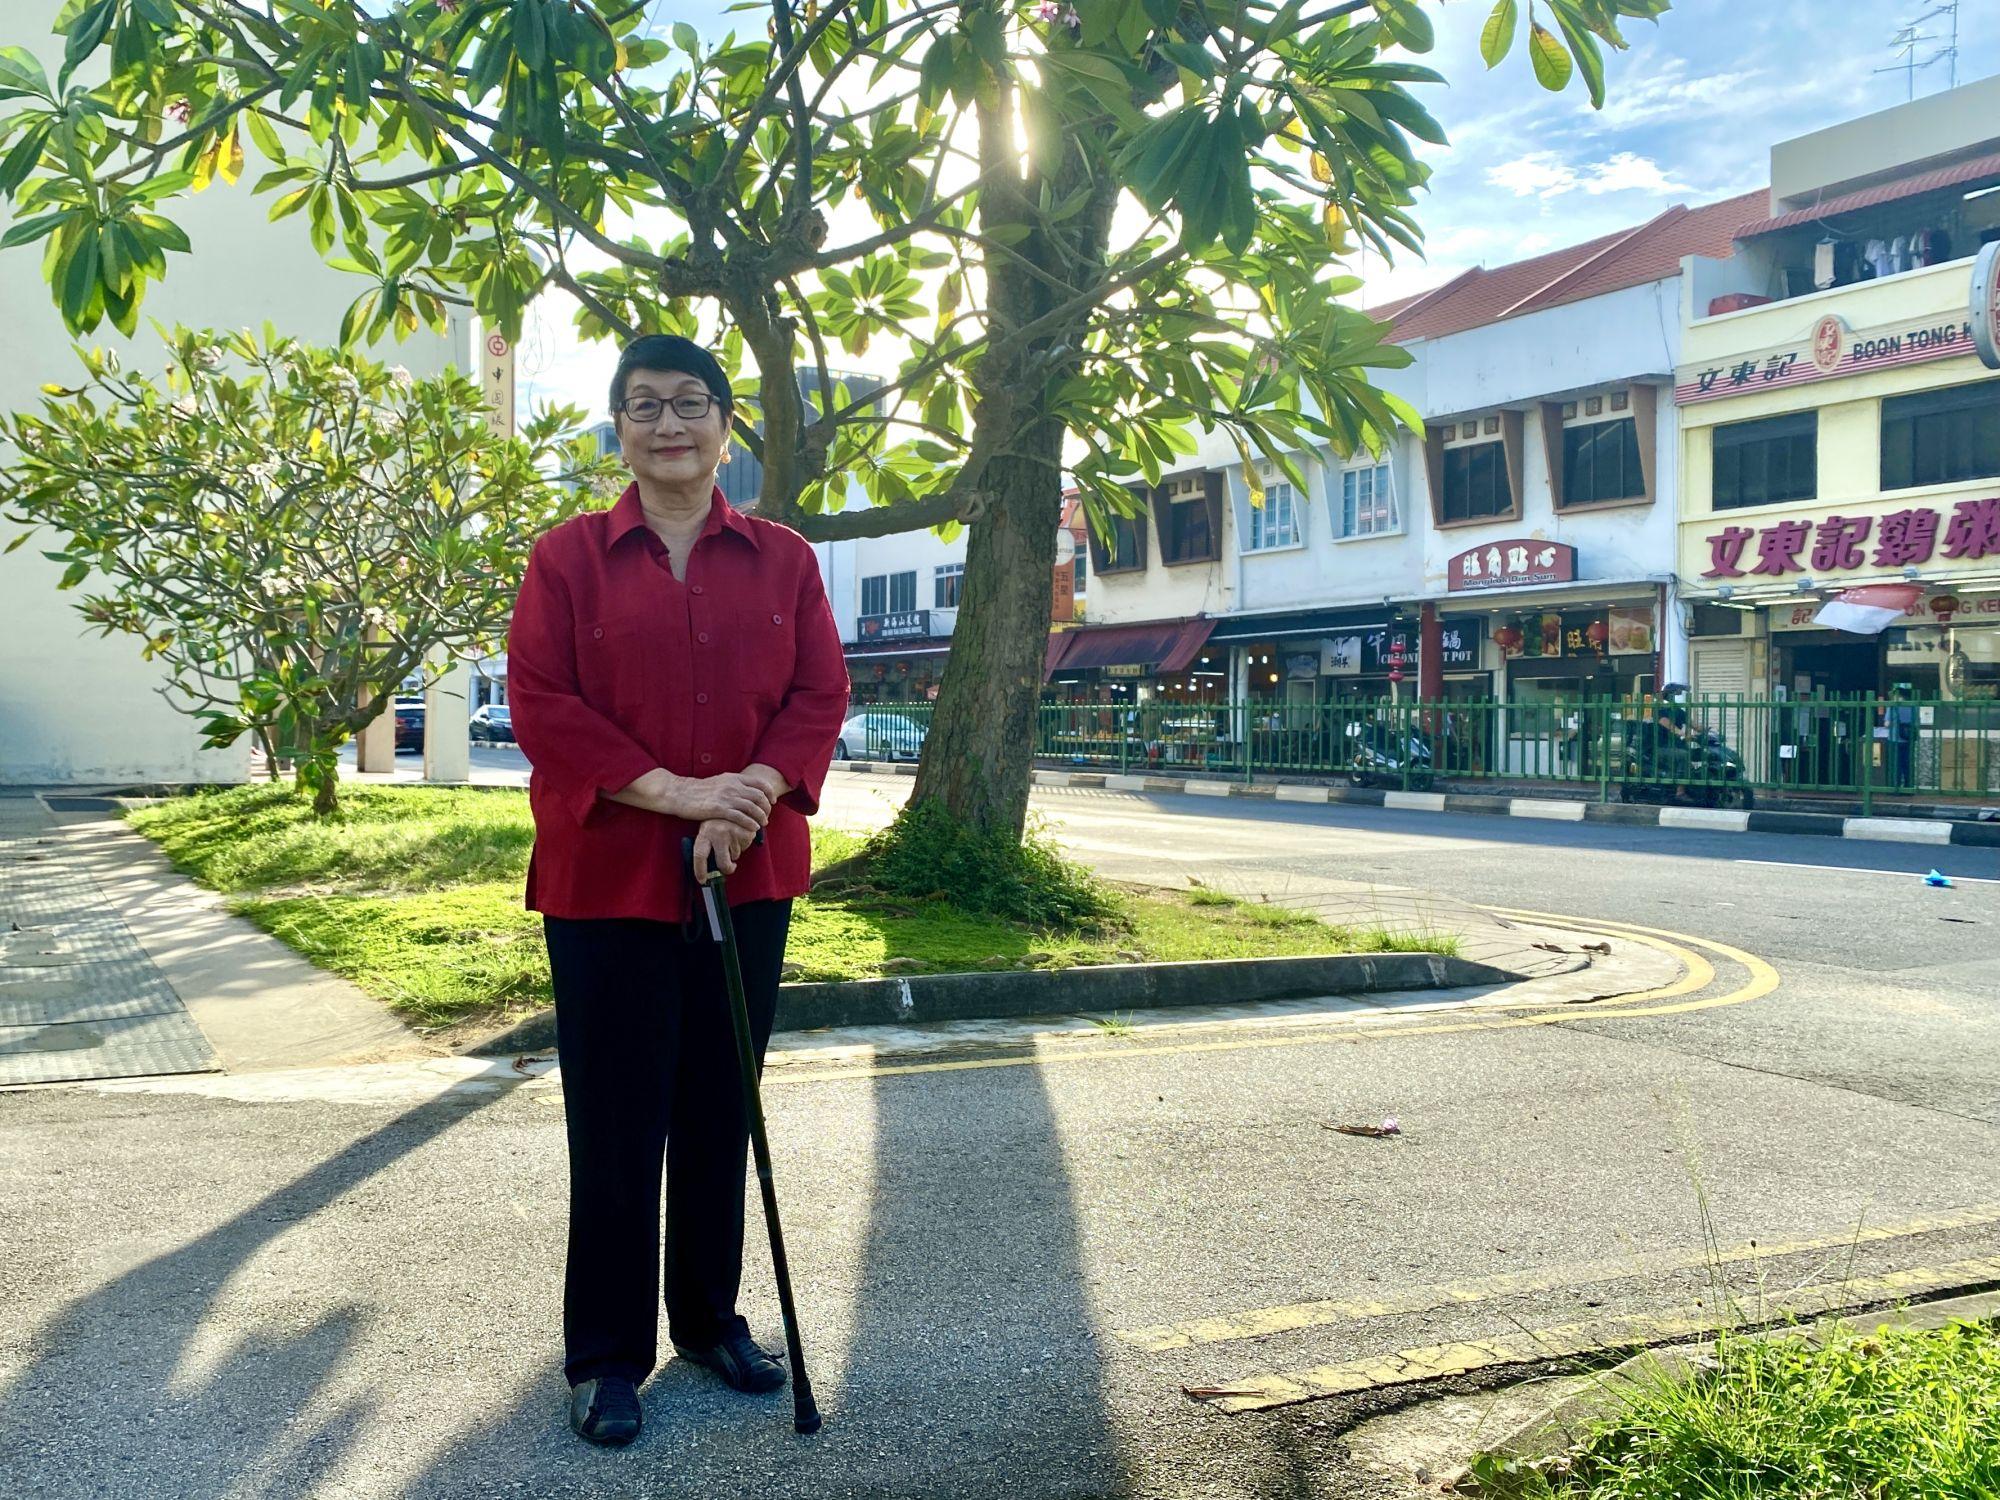 Violet Oon, Singapore's Grande Dame Of Peranakan Cuisine, Introduces Her Favourite Food Haunts